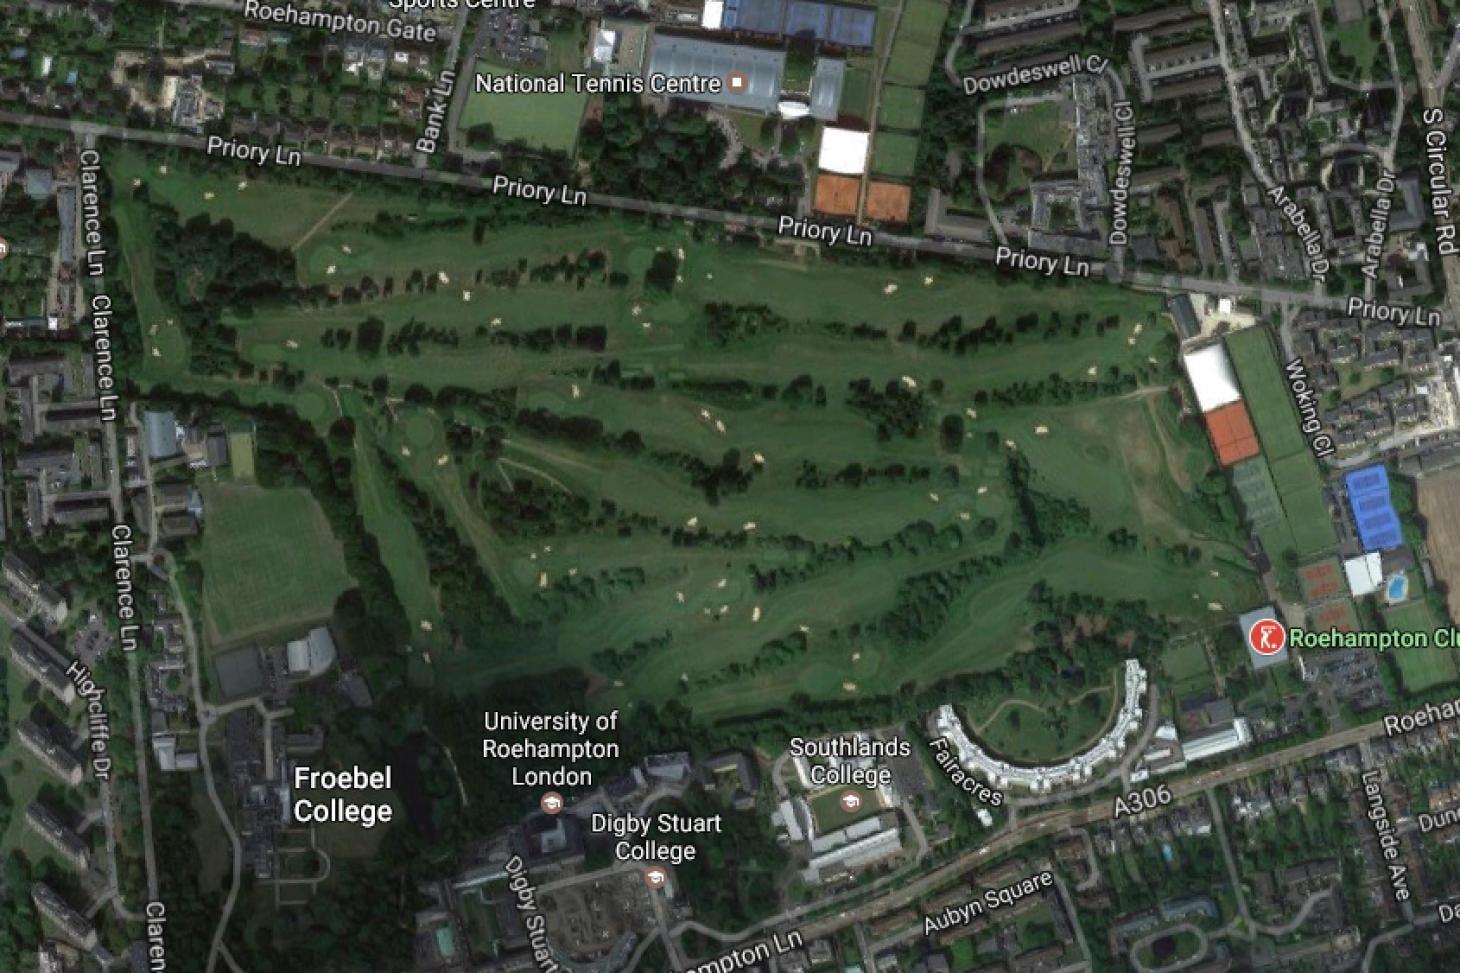 Roehampton Club 18 hole golf course